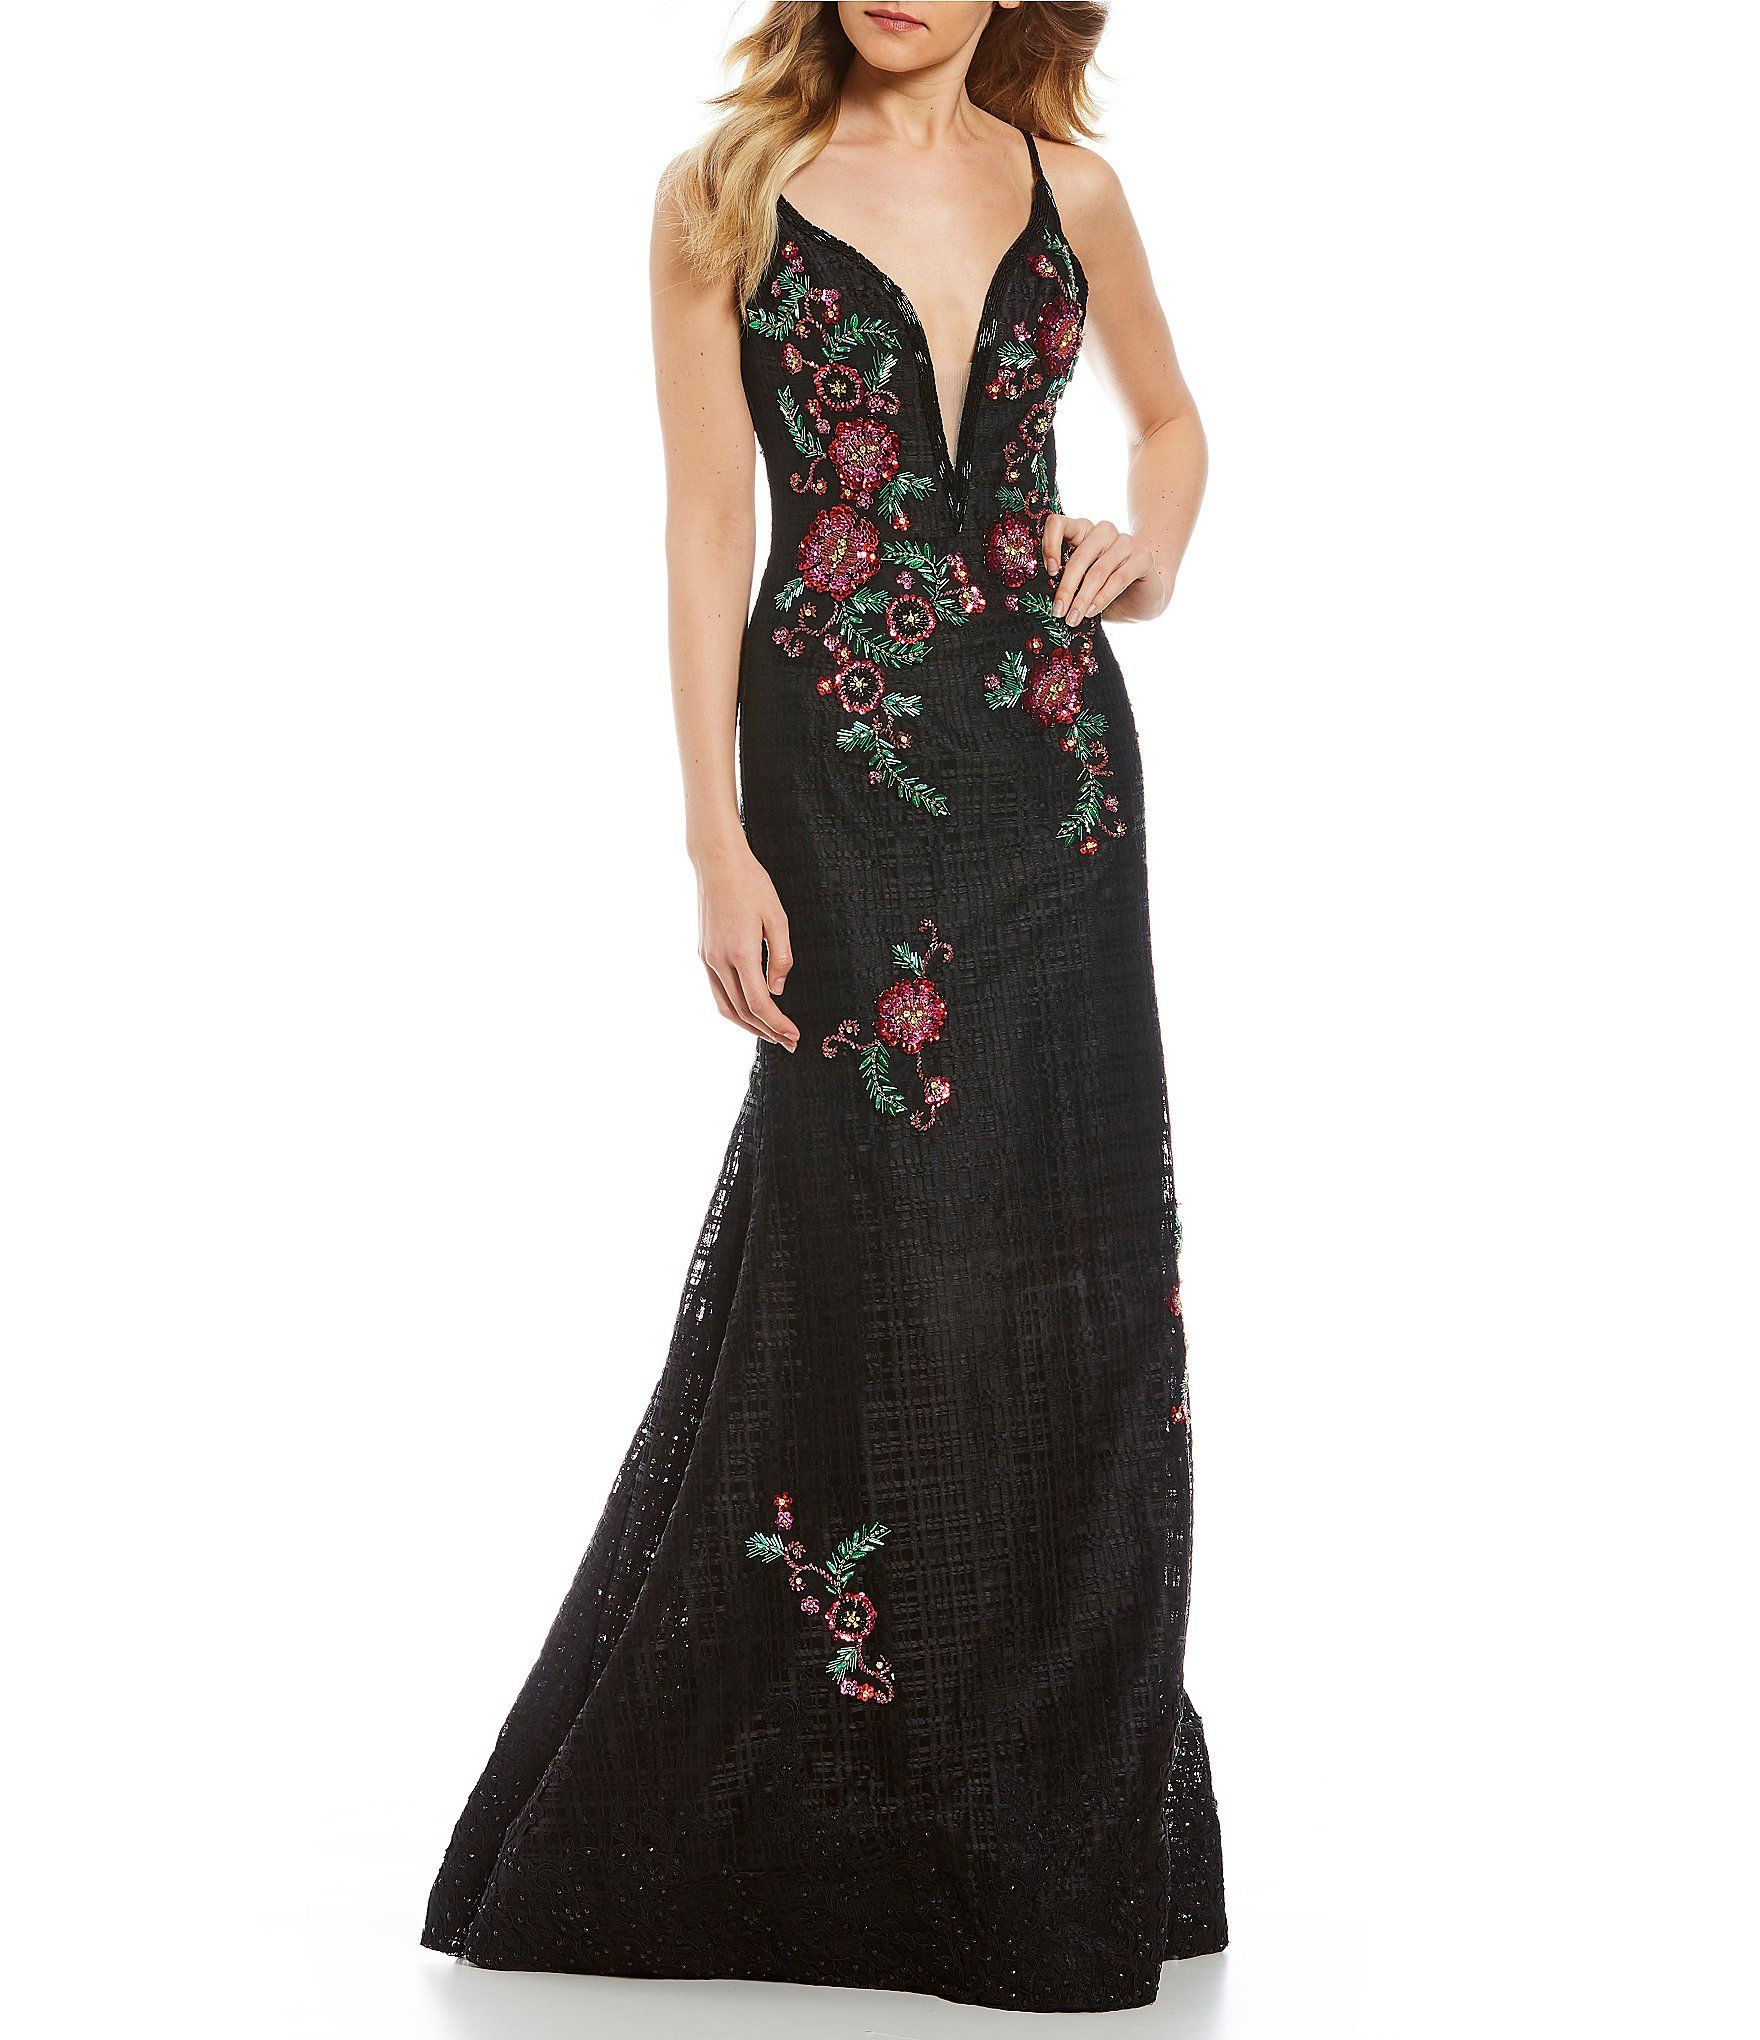 Gb social basketweave floral gown clothes pinterest dillards